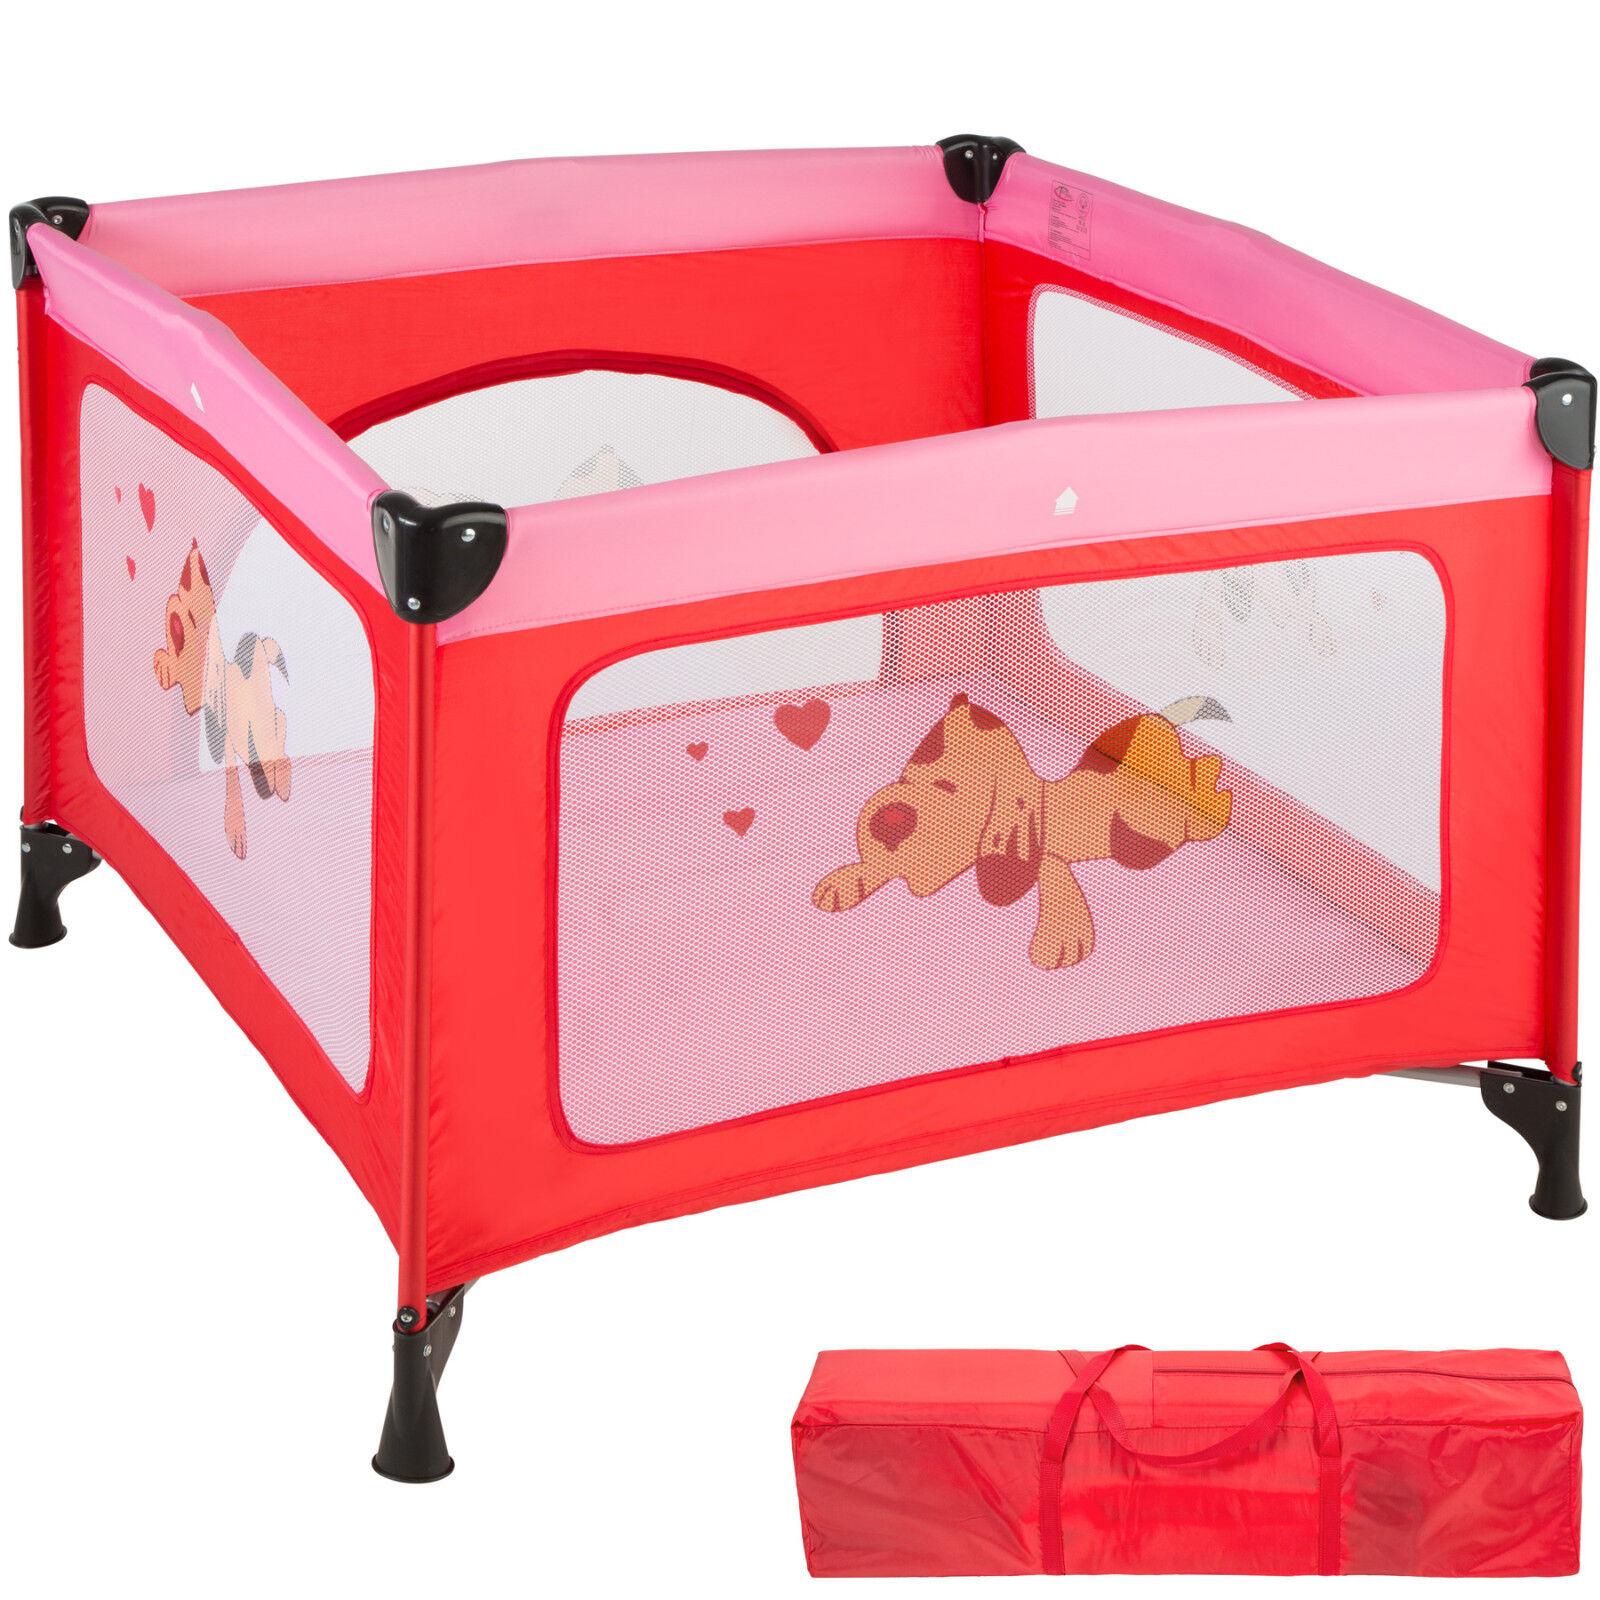 Parque para bebé cuna infantil de viaje portátil altura ajustable rosa